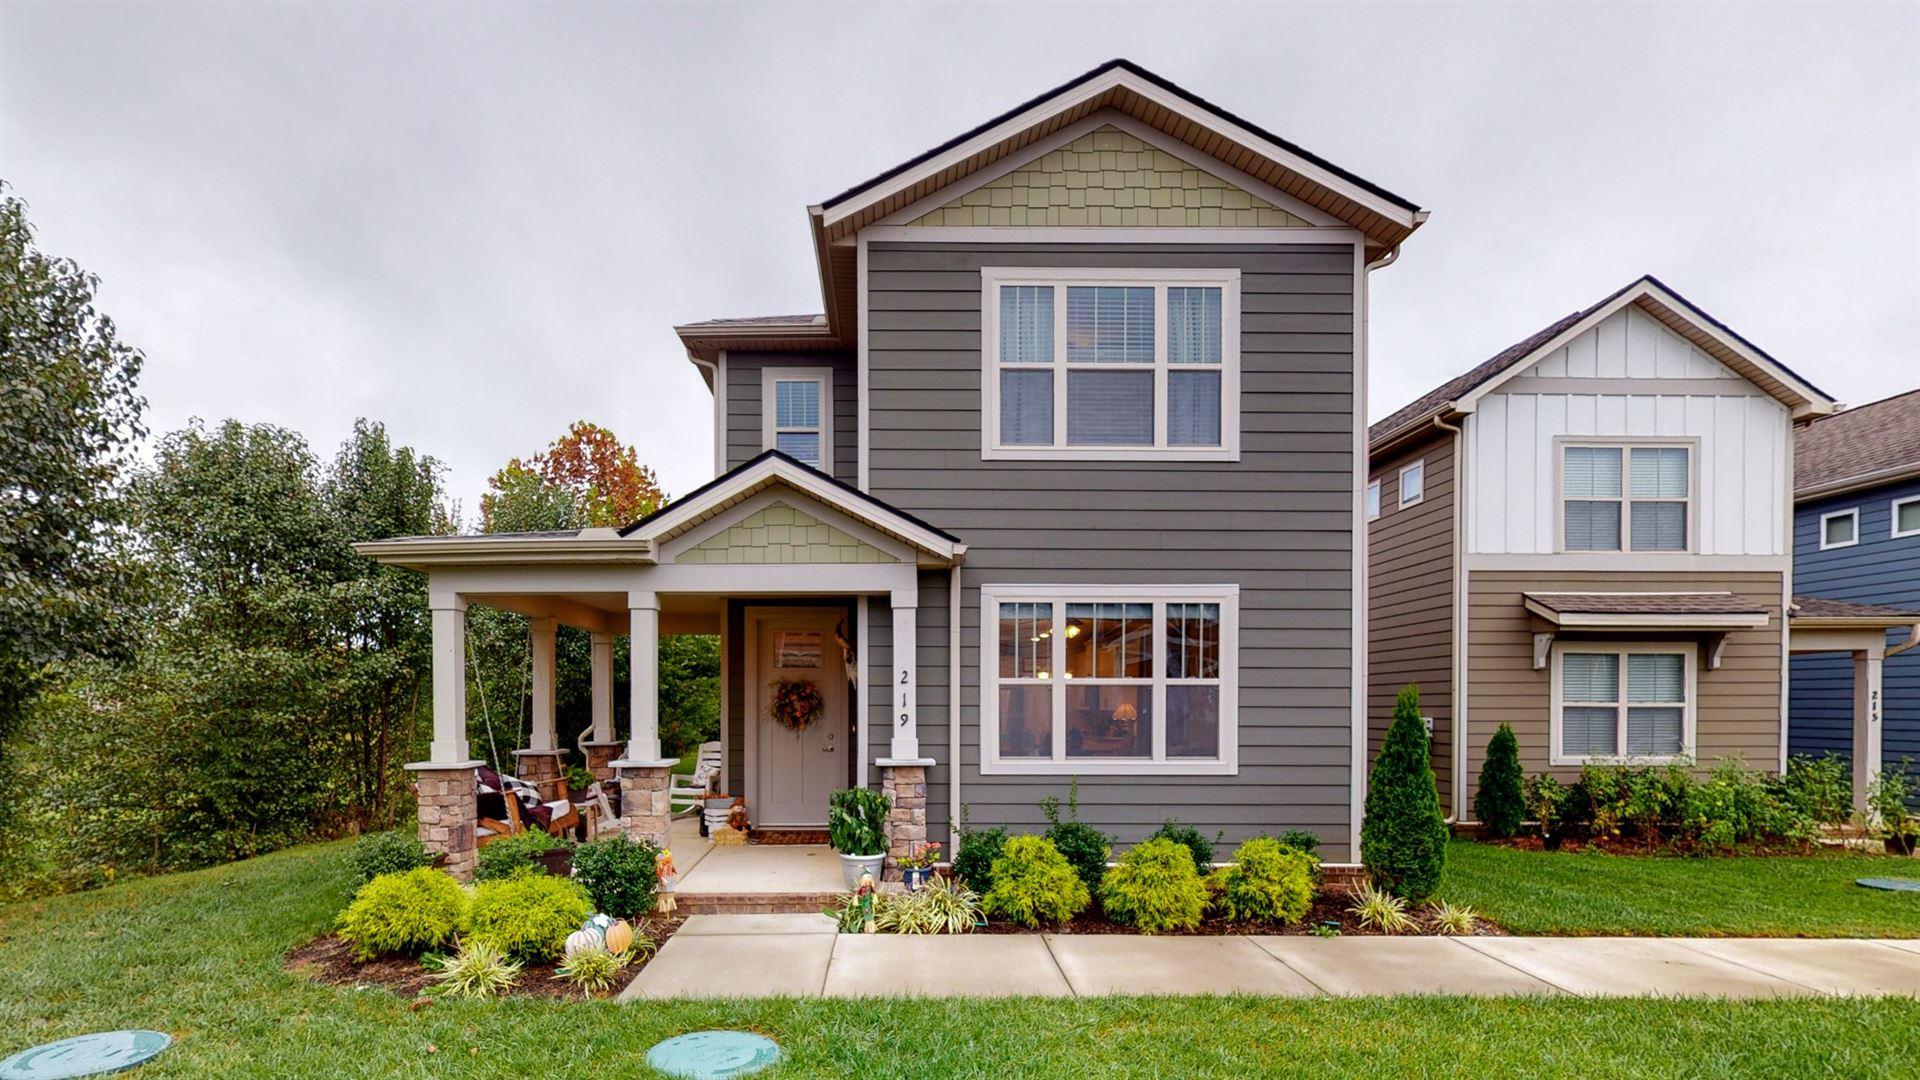 219 Manor Row, Pleasant View, TN 37146 - MLS#: 2194419